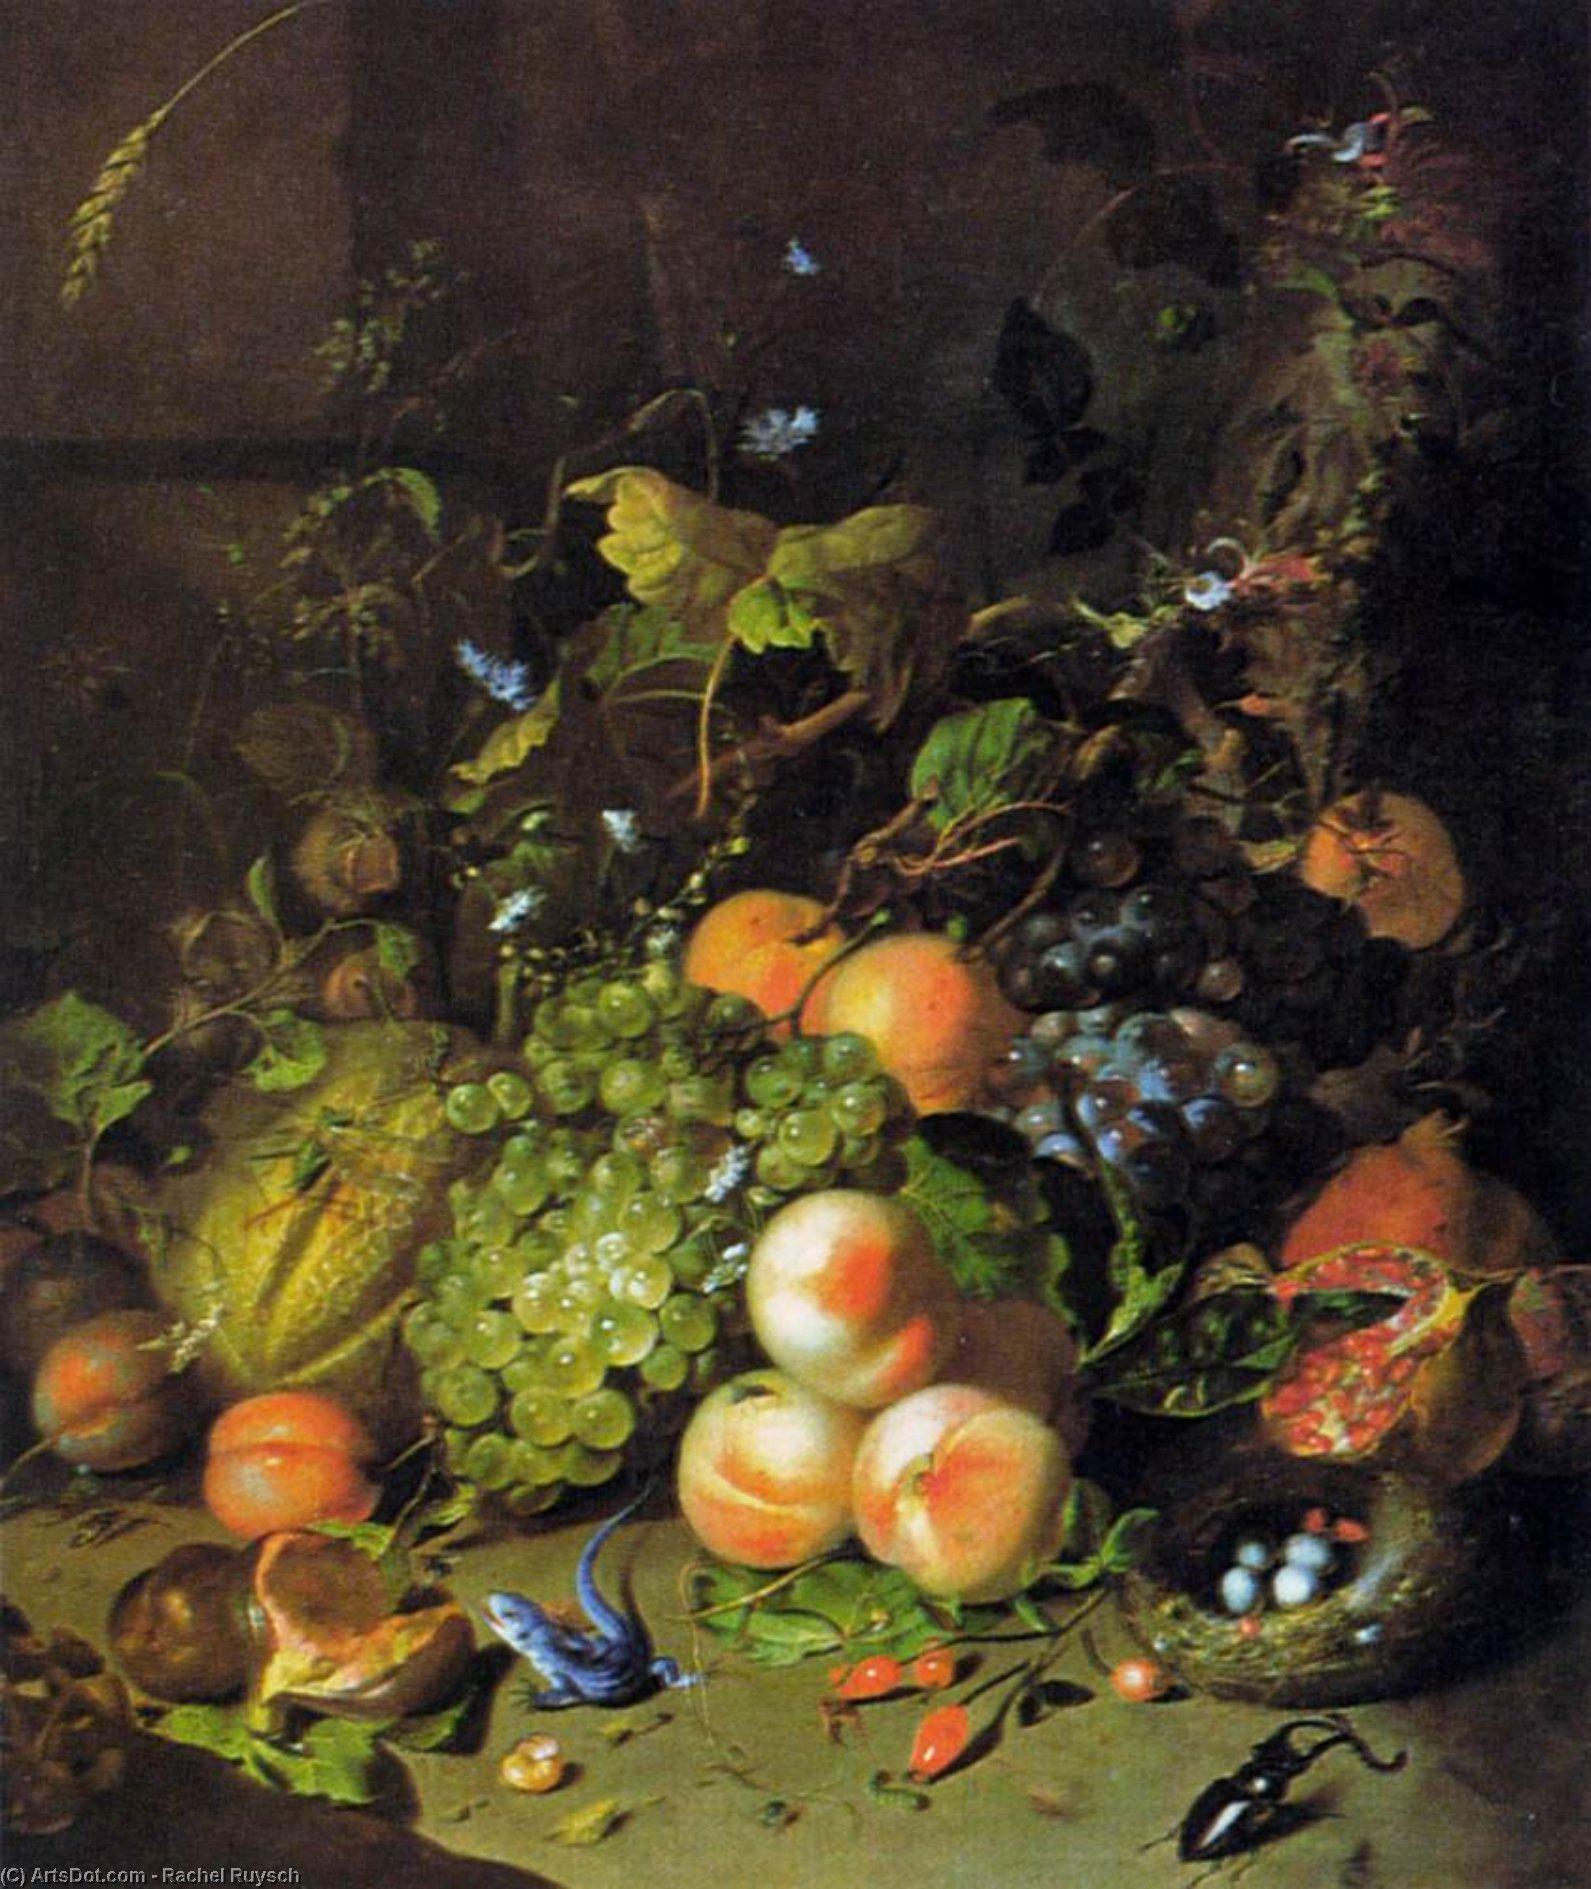 Wikioo.org - The Encyclopedia of Fine Arts - Painting, Artwork by Rachel Ruysch - Flower Still-Life